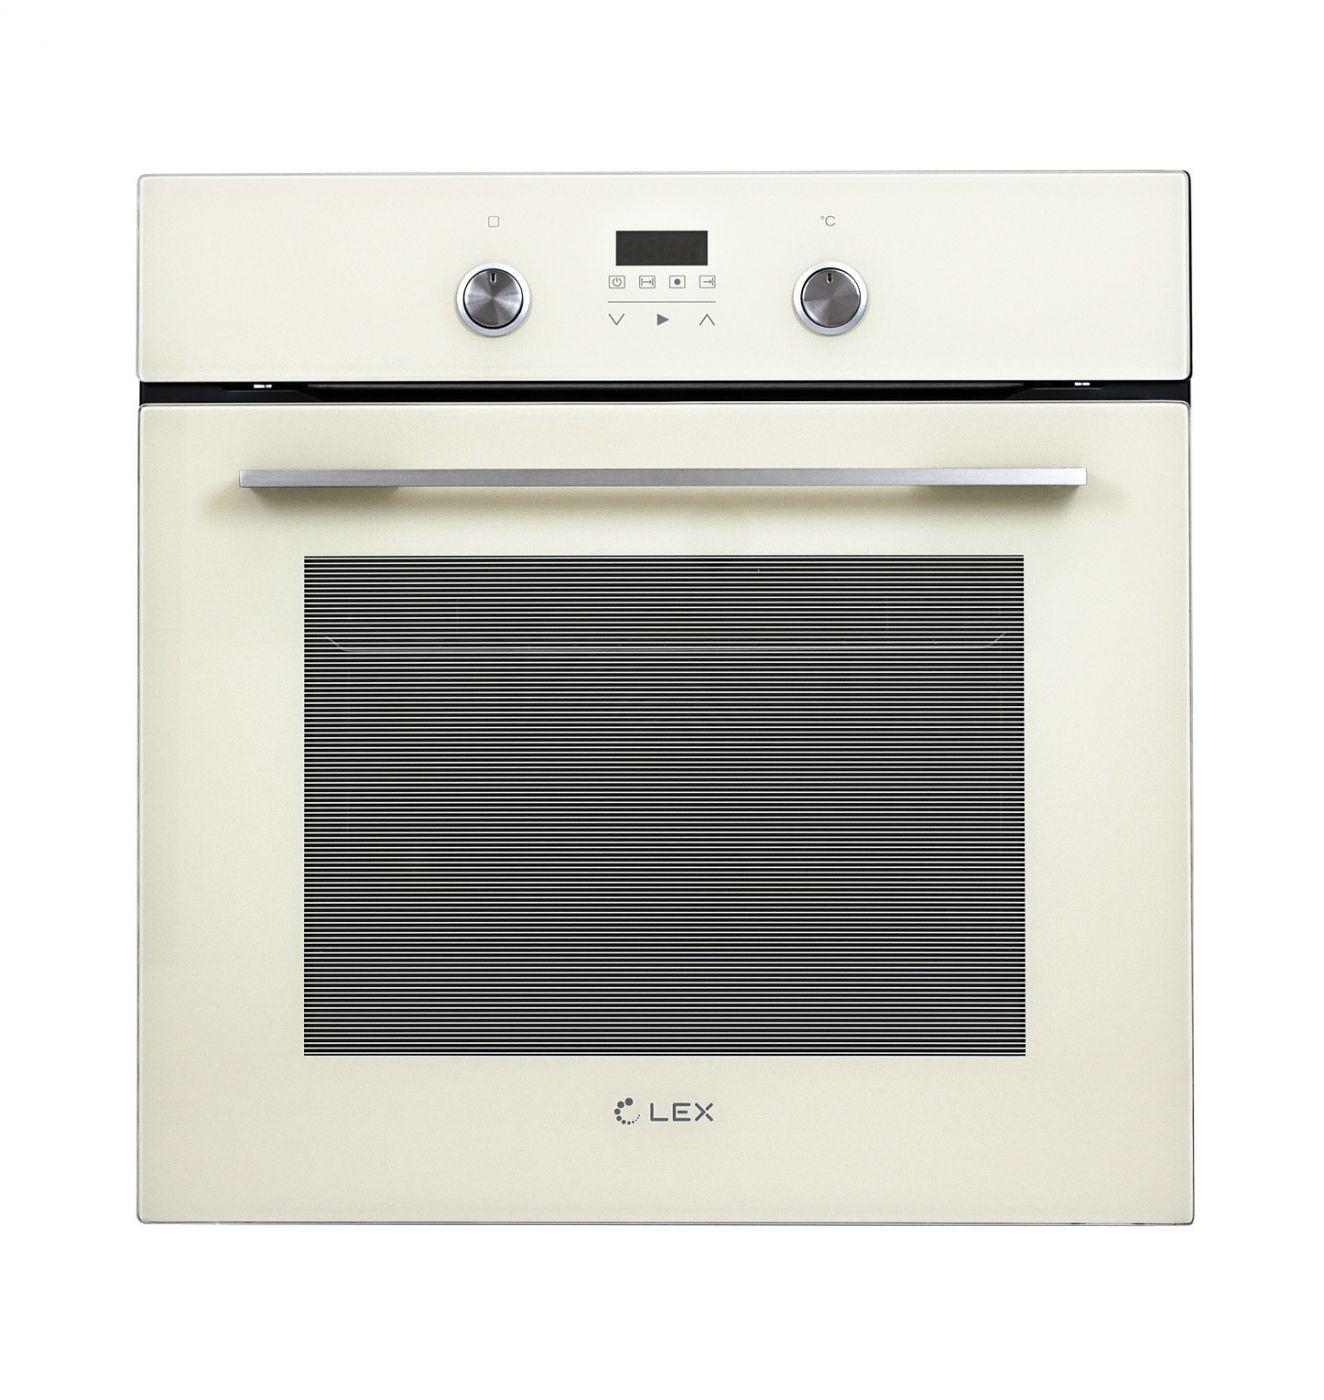 Электрический духовой шкаф Lex EDP 6092 IV LIGHT (CHAO000348)